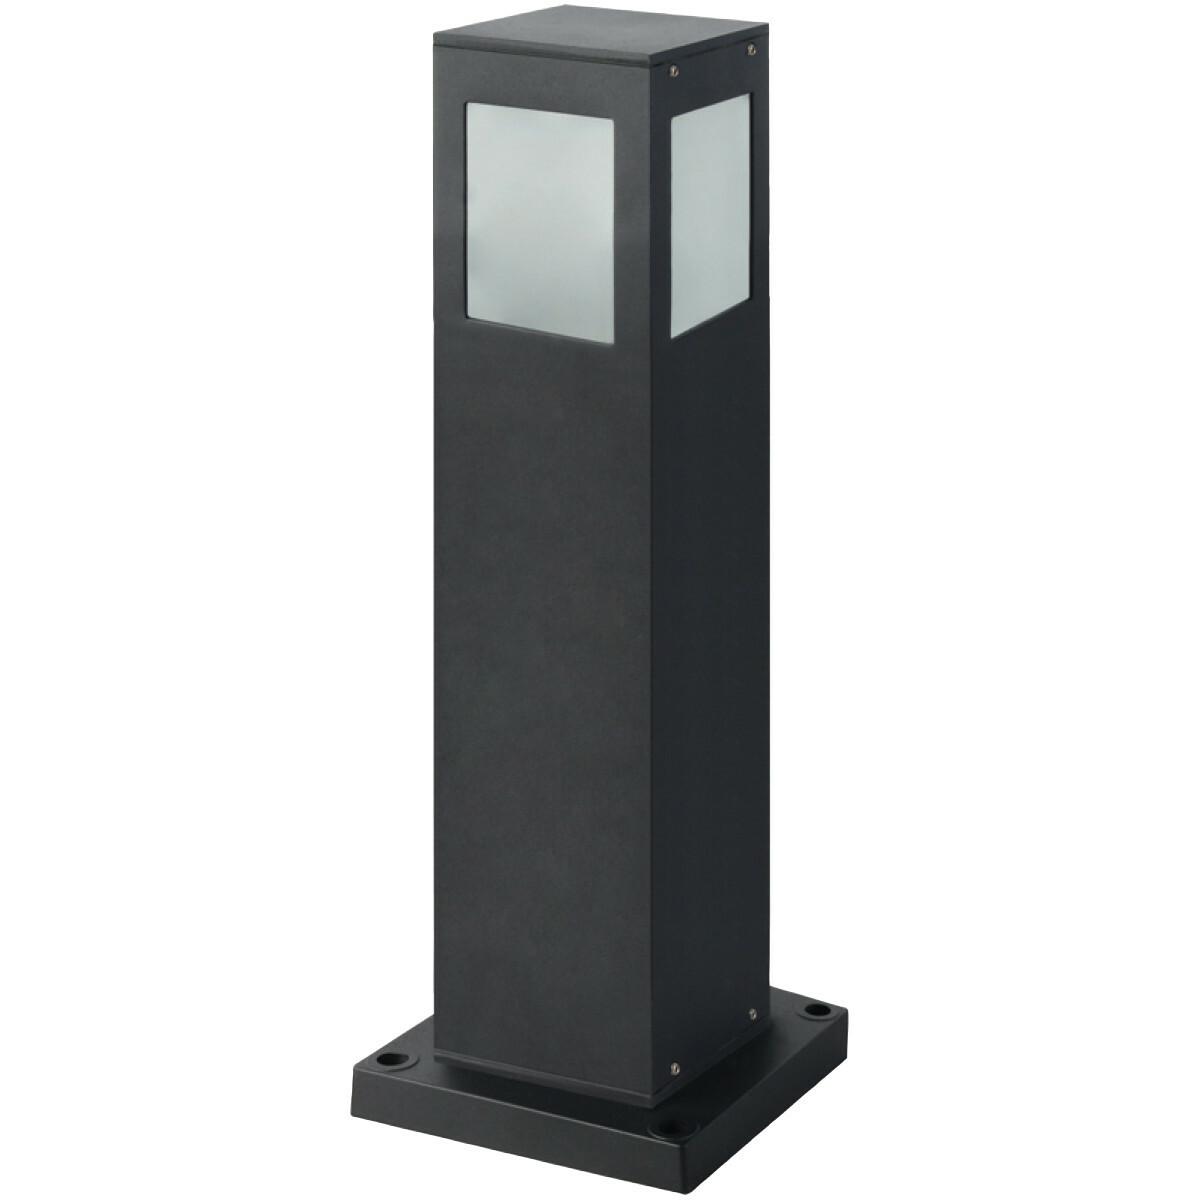 PHILIPS - LED Tuinverlichting - Staande Buitenlamp - CorePro Lustre 827 P45 FR - Kavy 4 - E27 Fittin